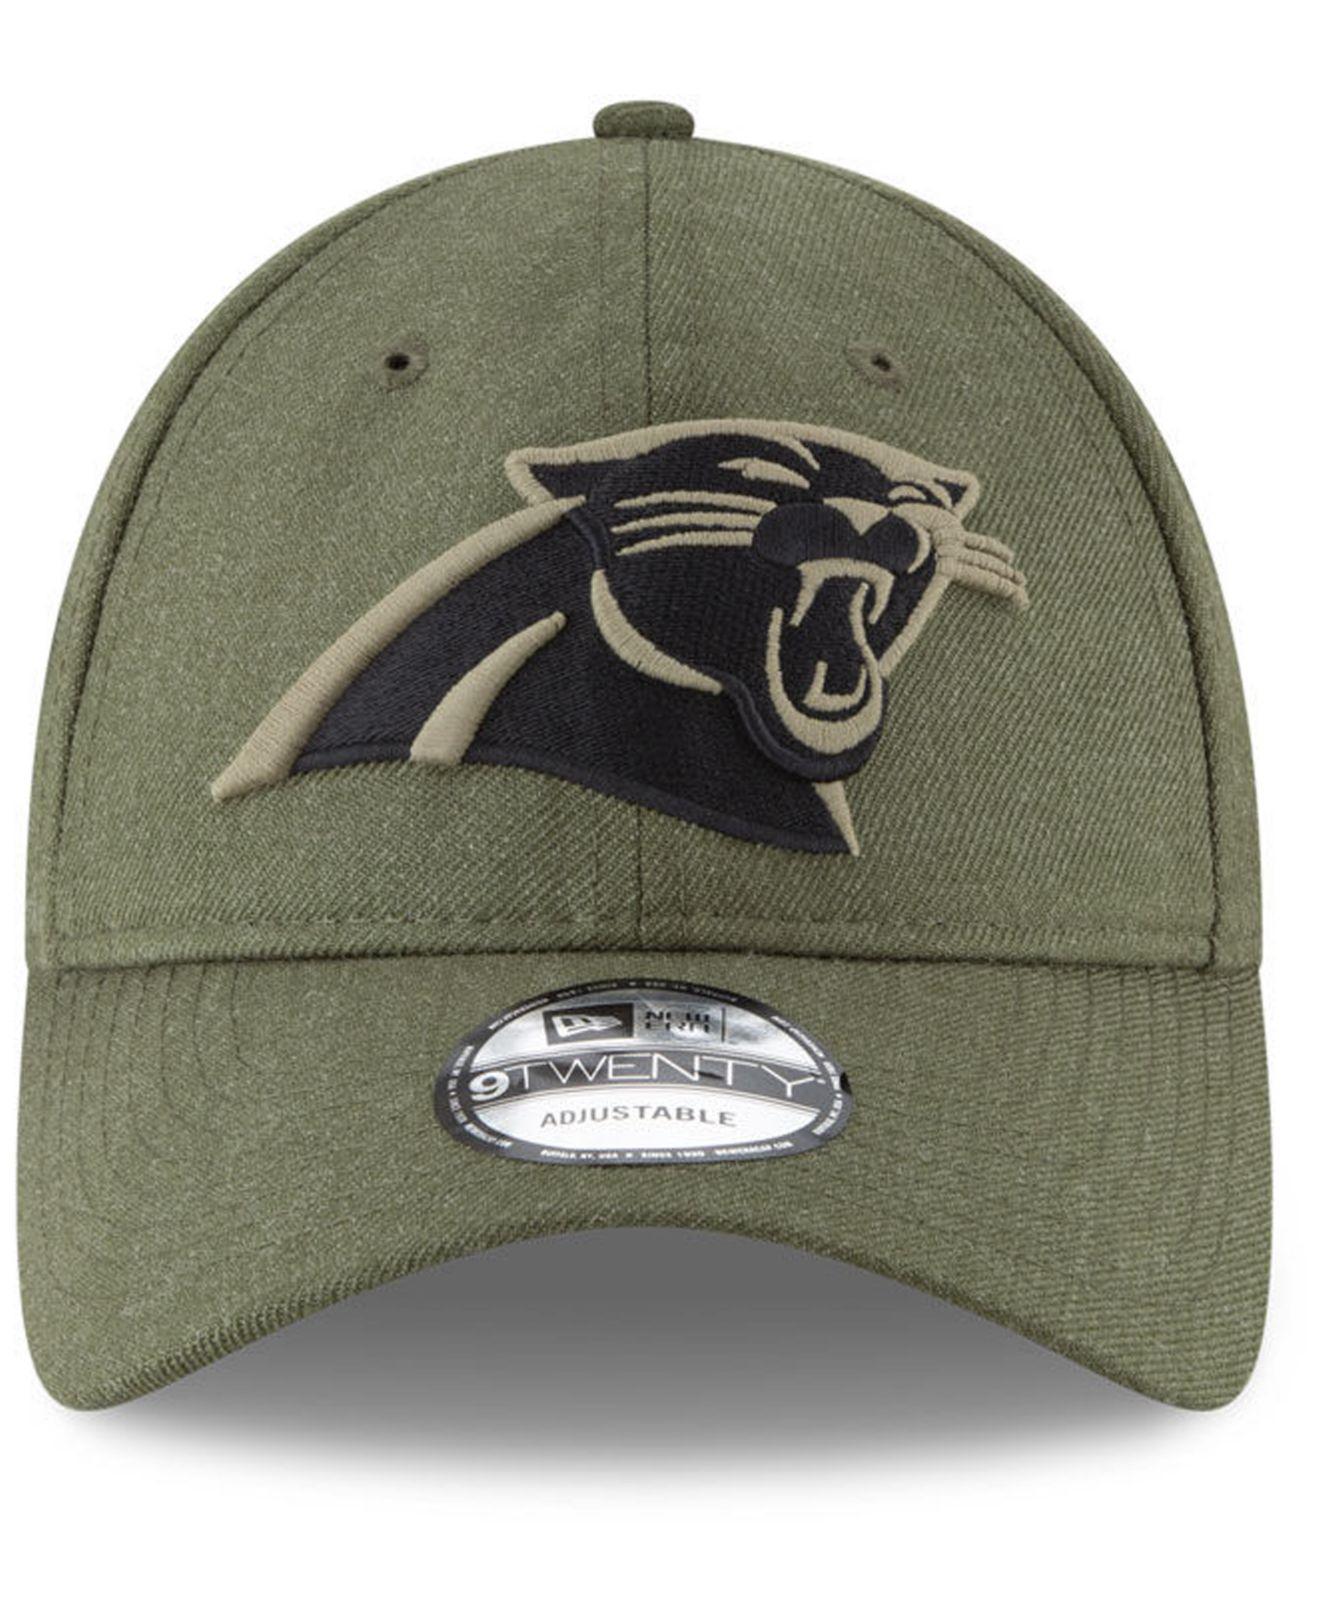 Lyst - Ktz Carolina Panthers Salute To Service 9twenty Cap in Green for Men 2b79be9a7